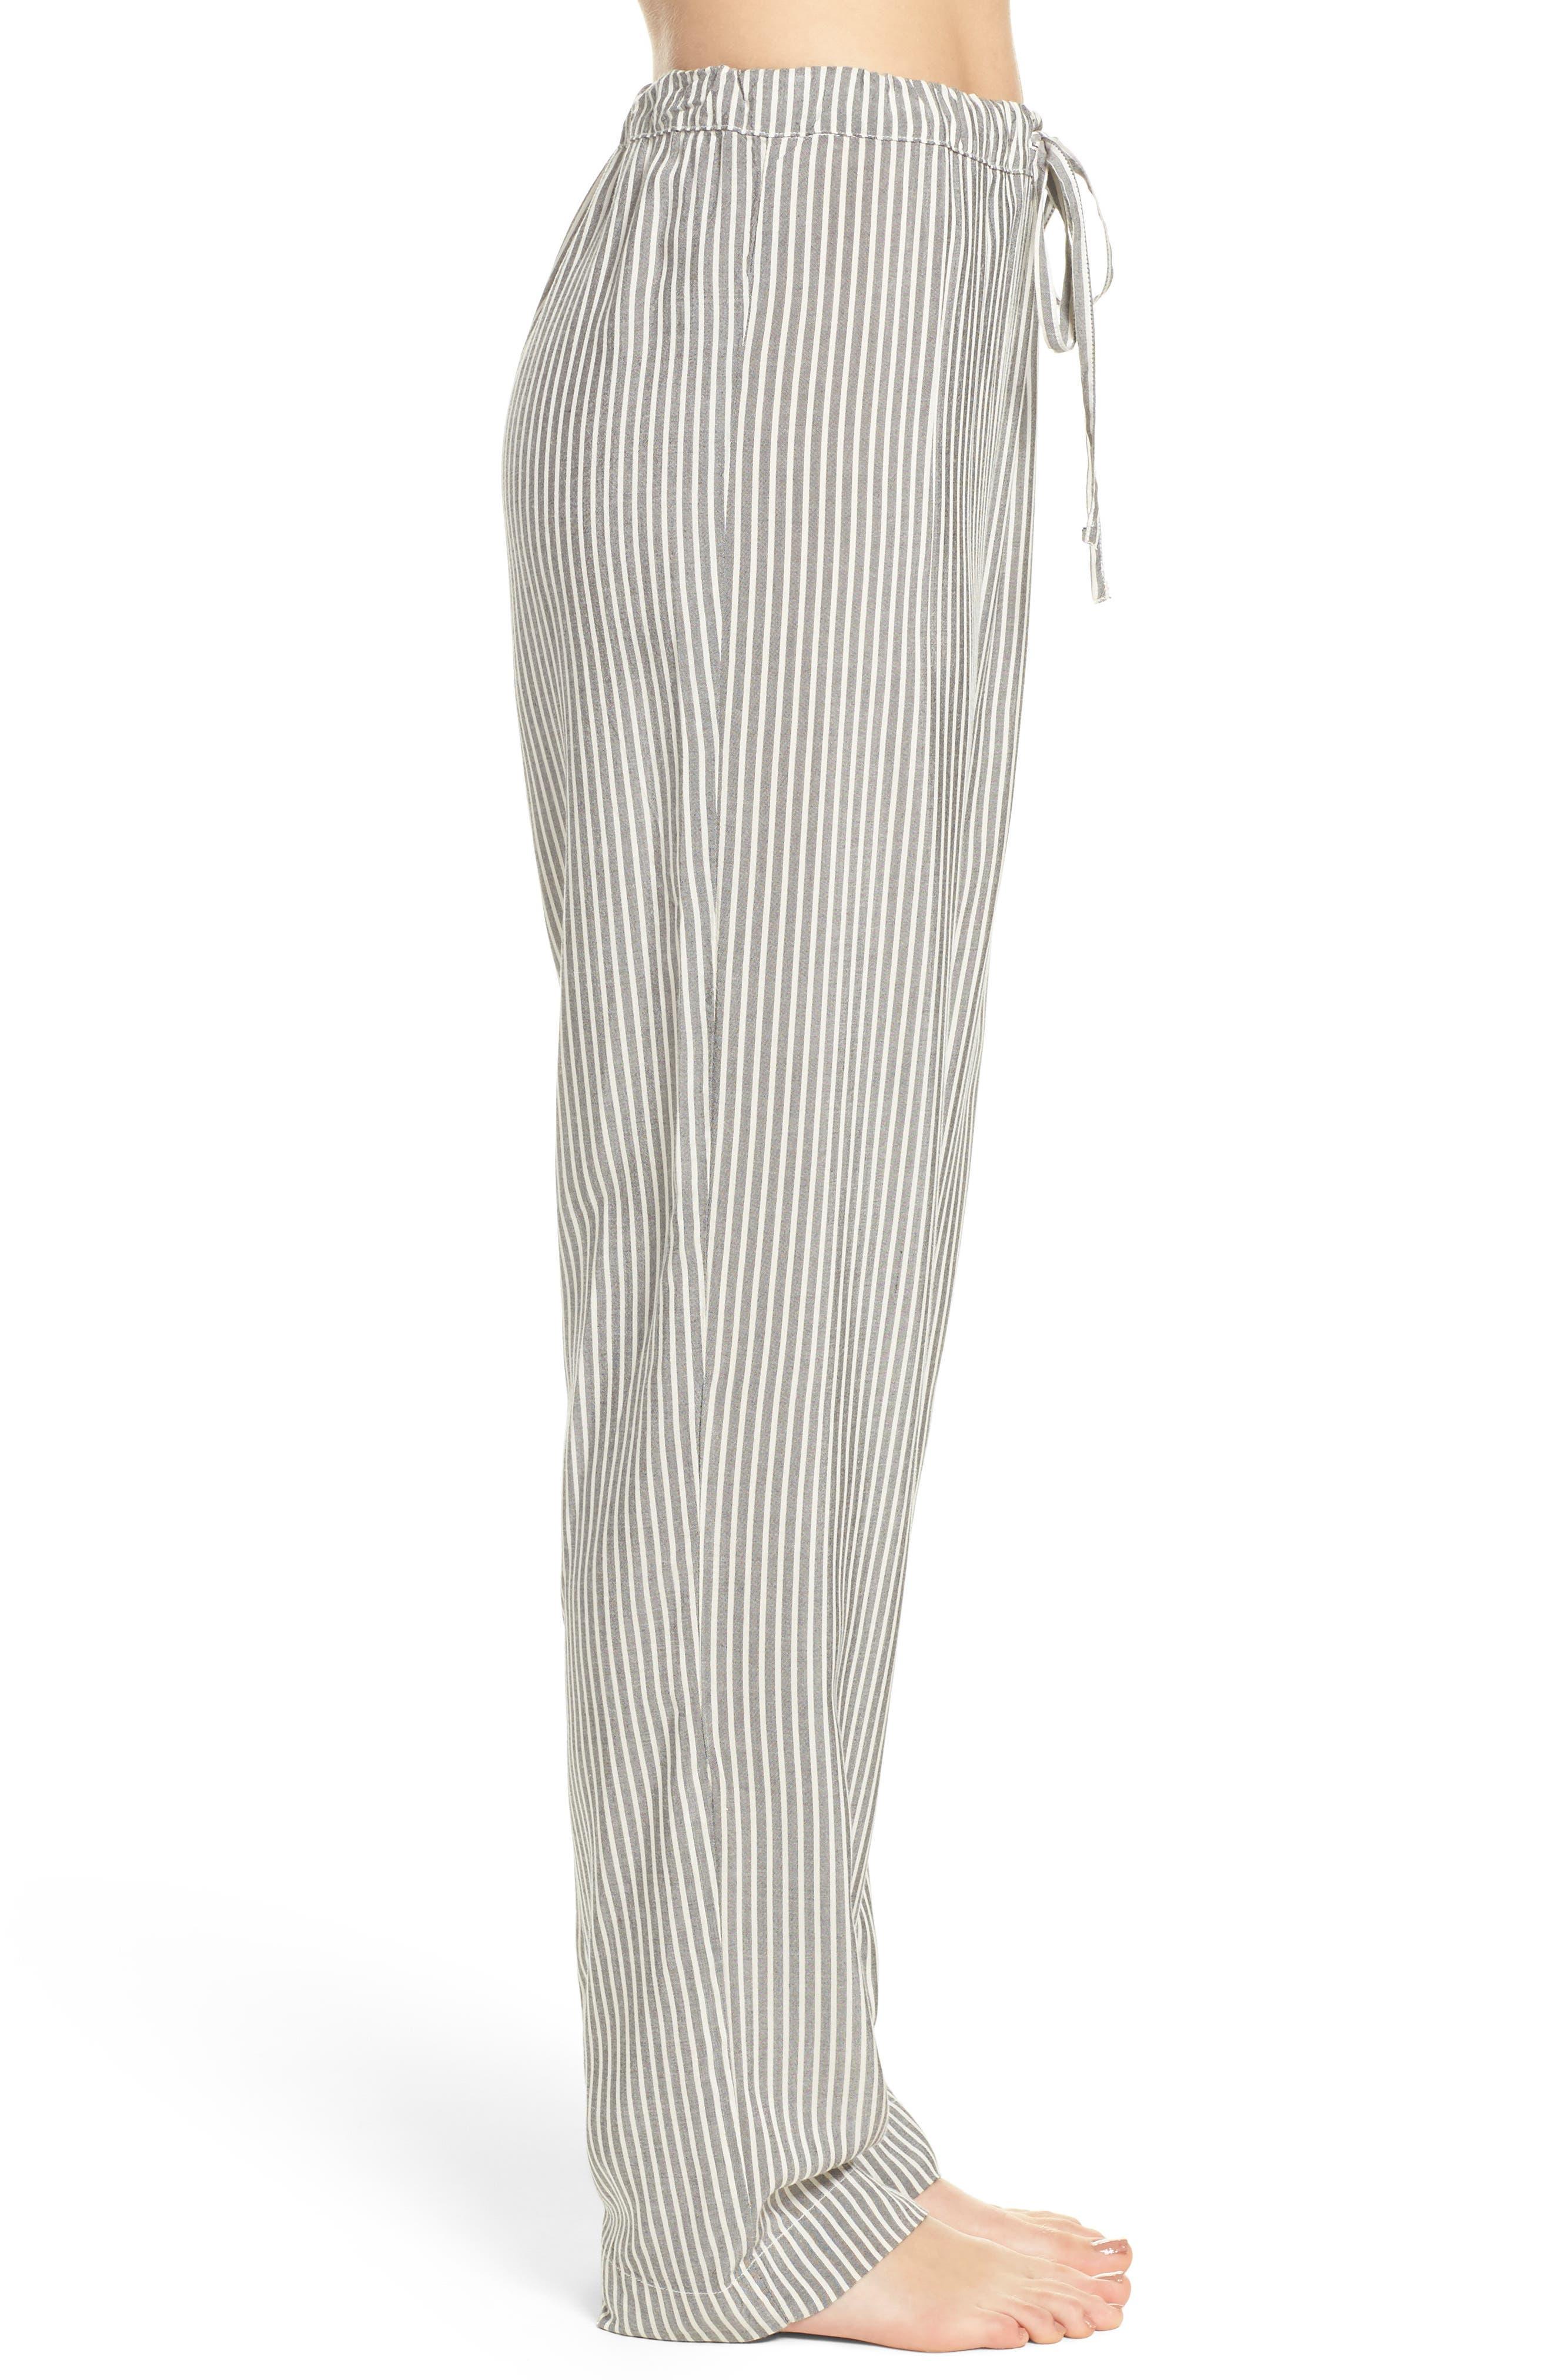 Stripe Pajama Pants,                             Alternate thumbnail 3, color,                             020